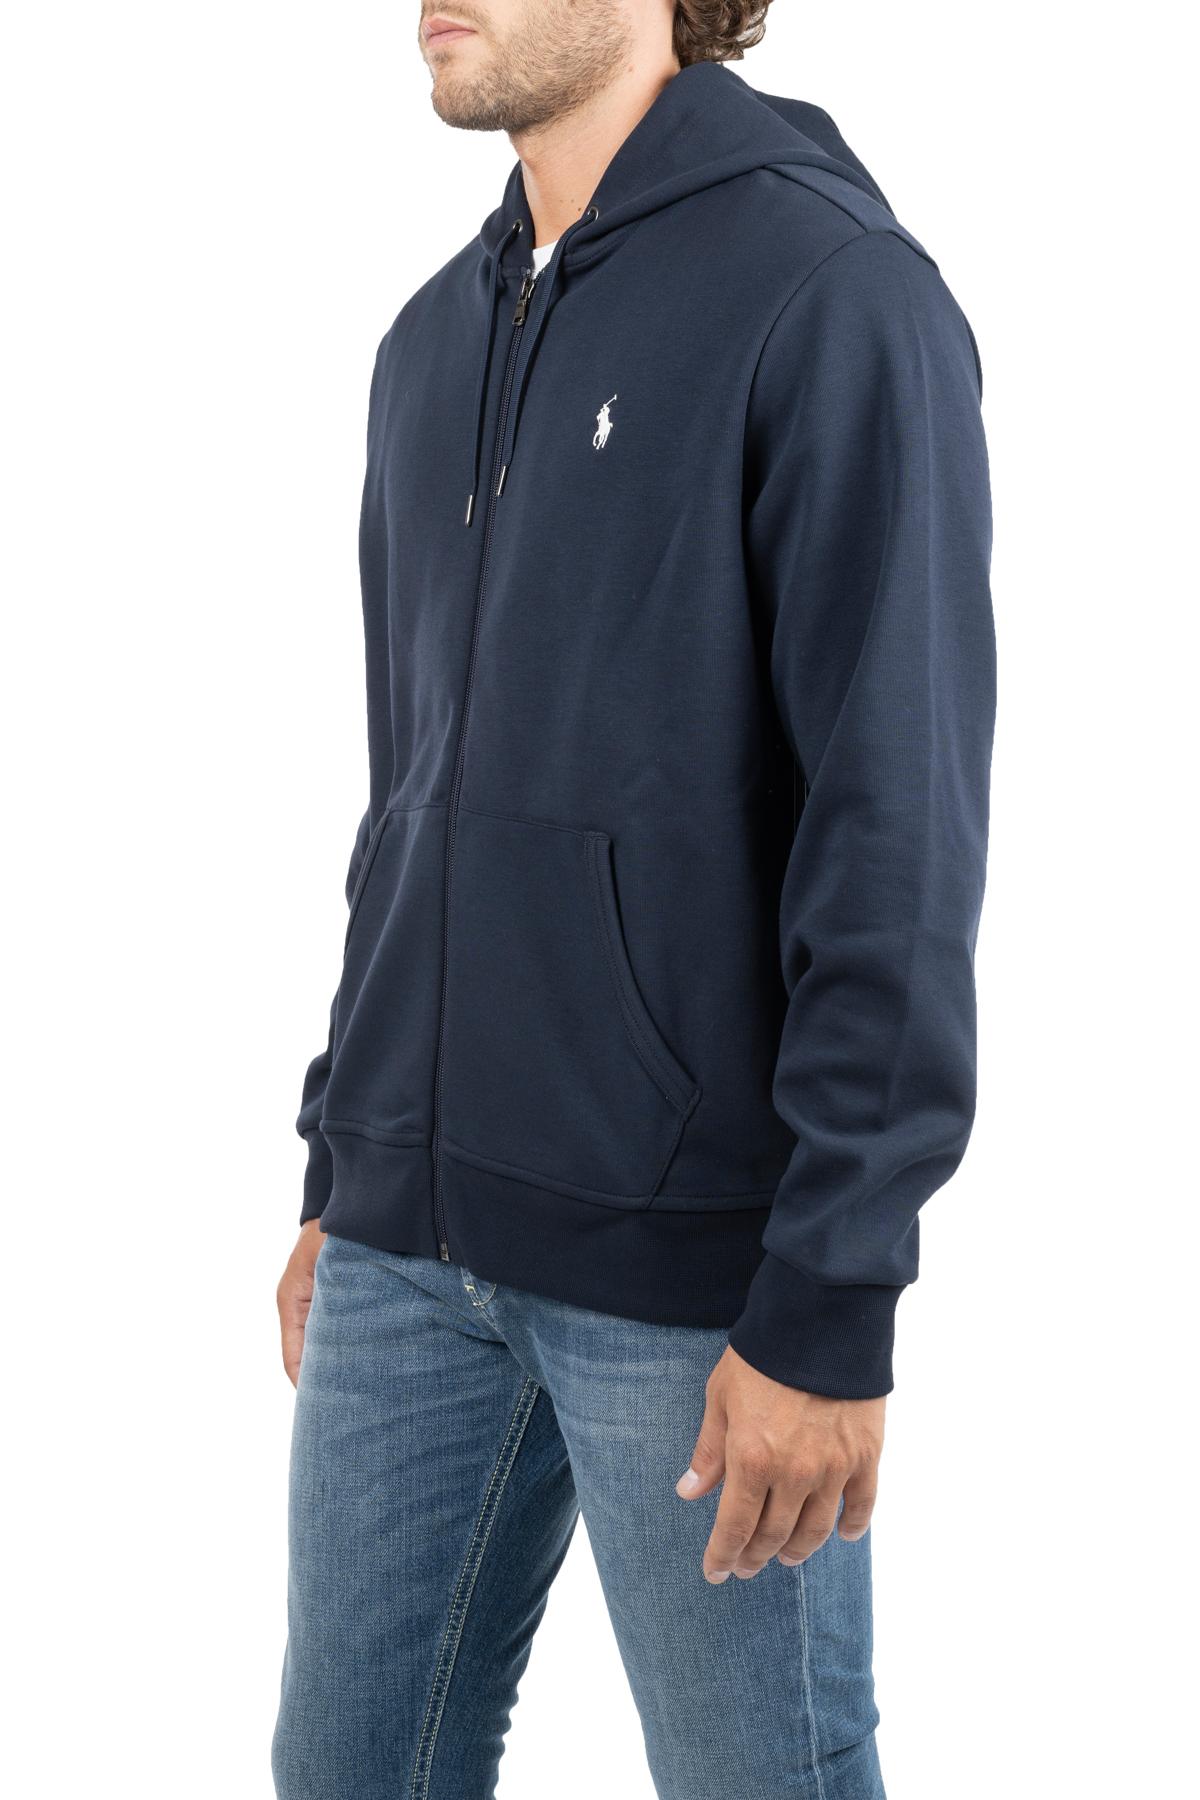 BLUE COTTON SWEATSHIRT WITH LOGO EMBROIDERY POLO RALPH LAUREN | Sweatshirts | 710652313008